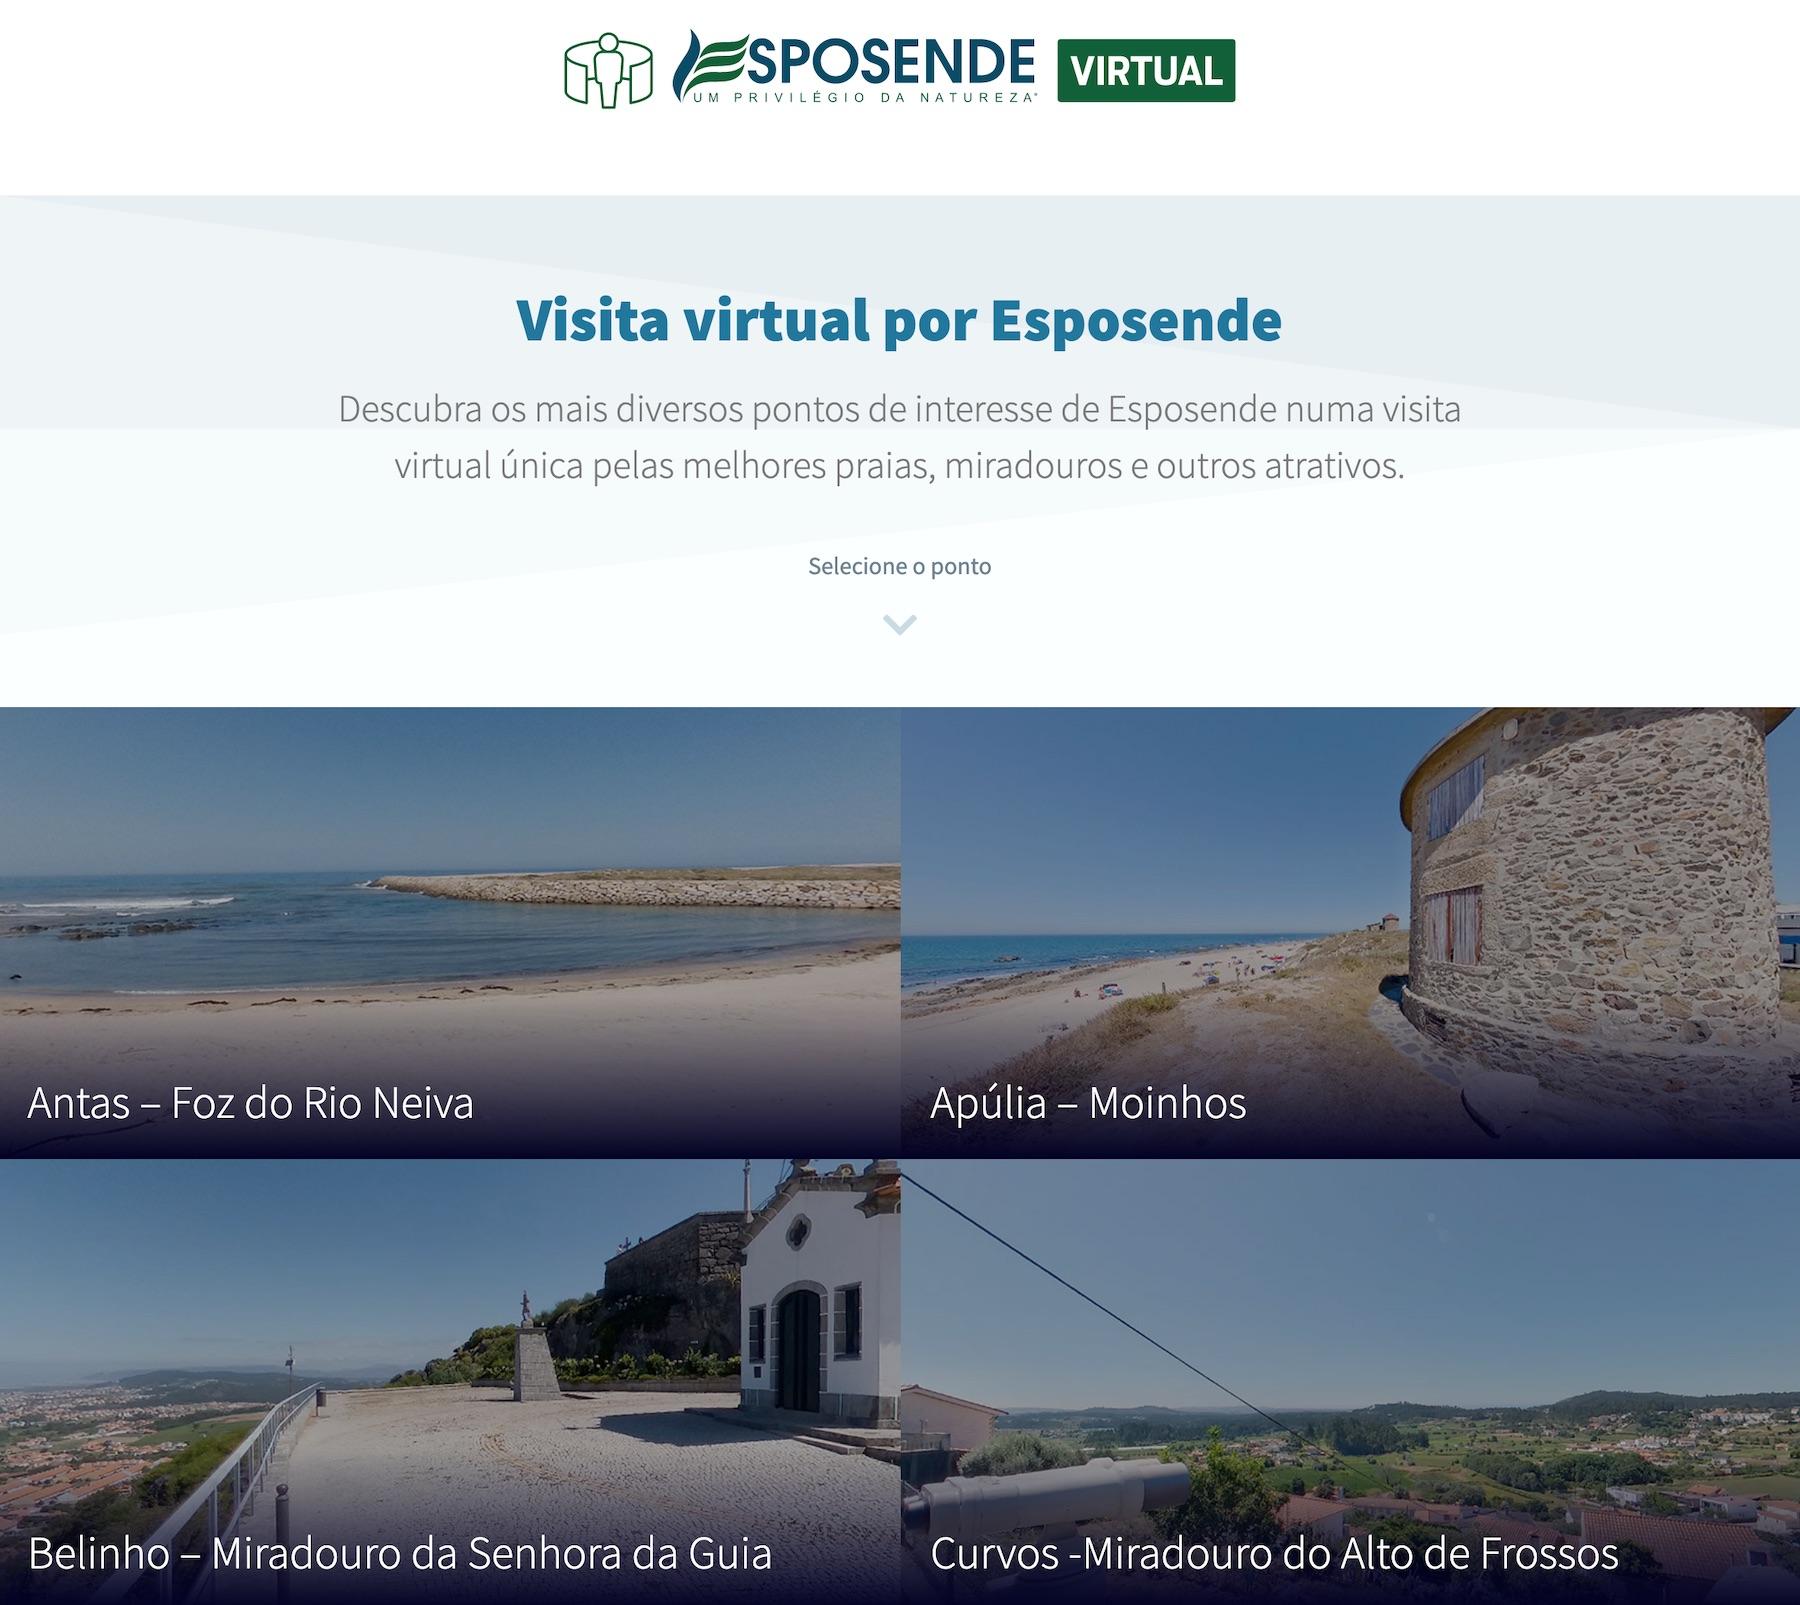 Esposende Virtual